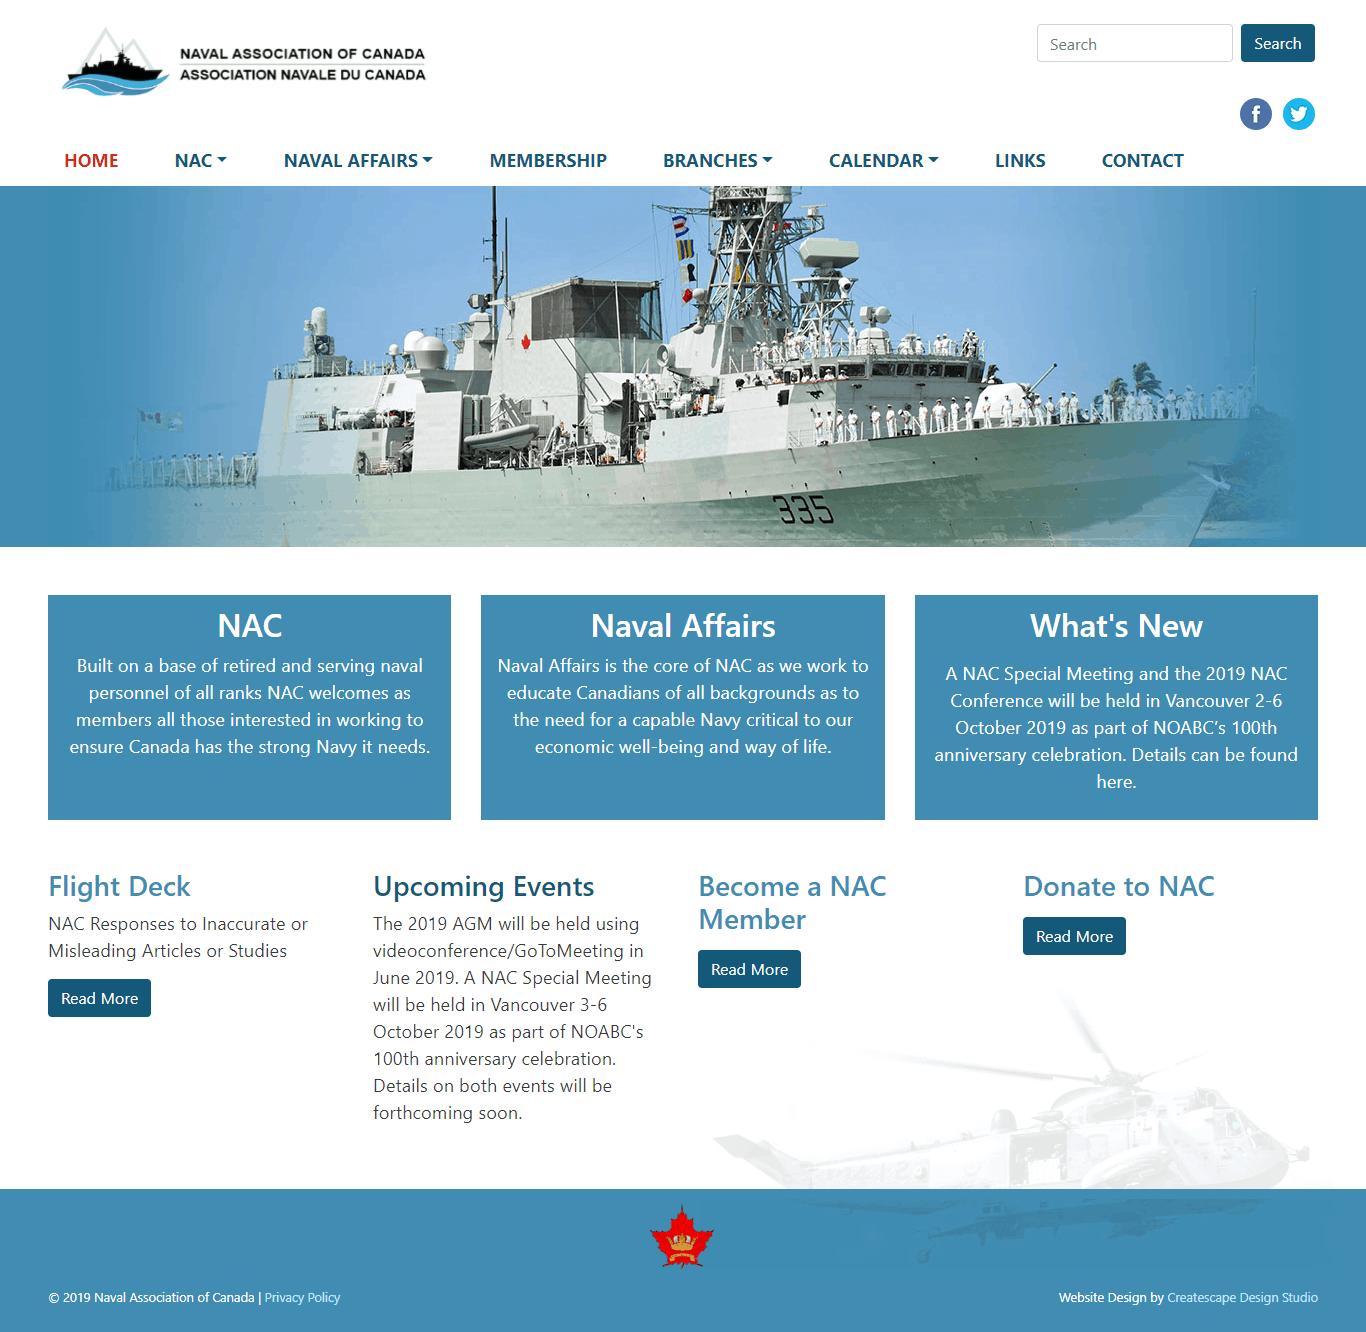 Website Re Design For The Naval Association Of Canada Createscape Design Studio